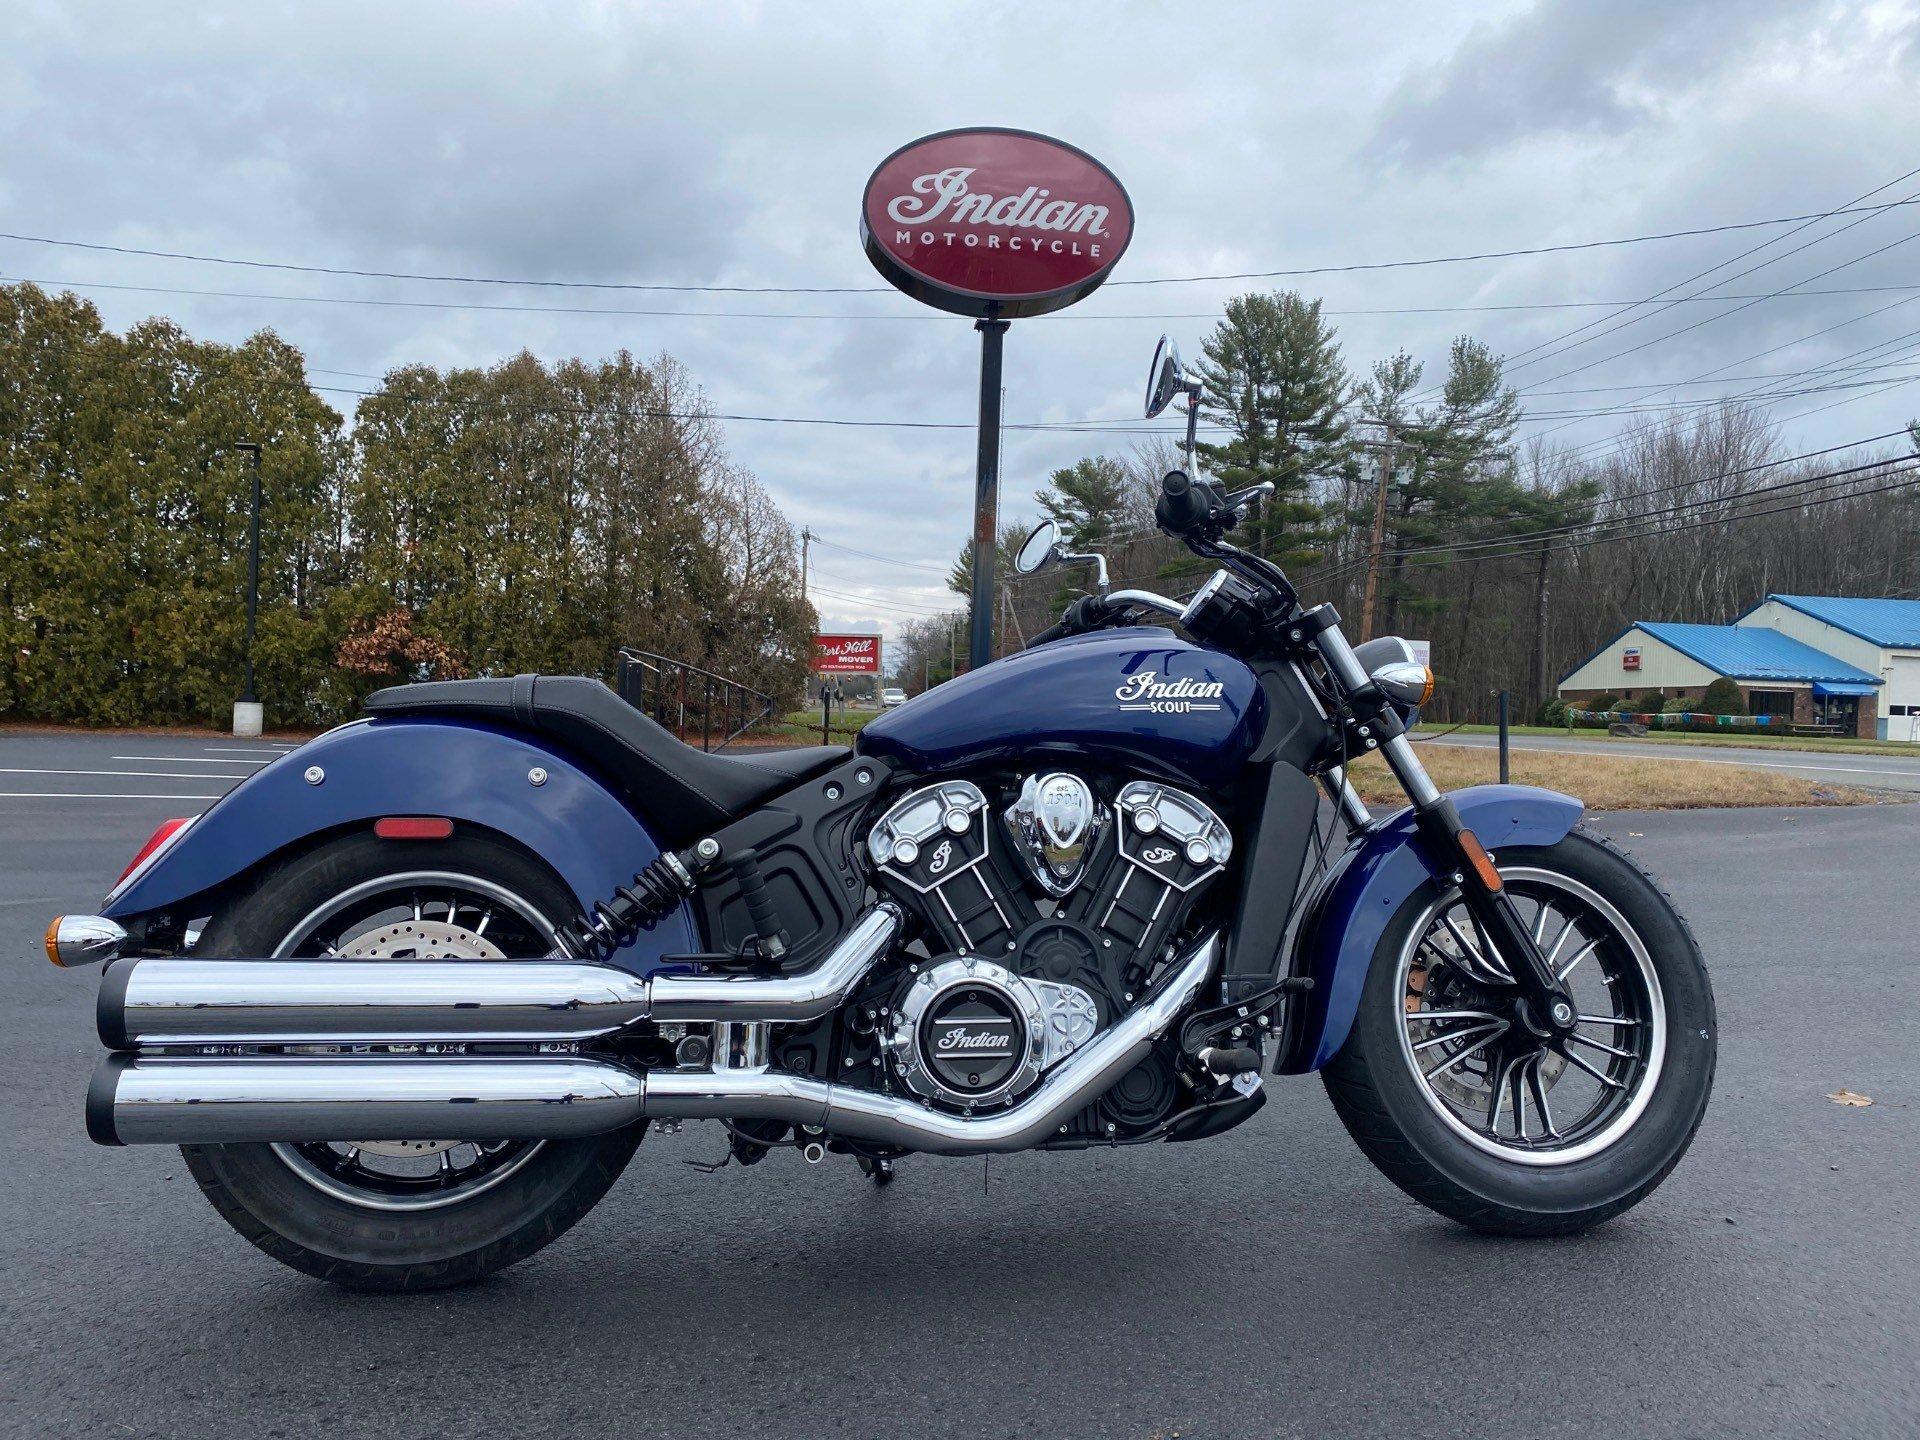 2017 Indian Springfield™ Motorcycles Westfield Massachusetts